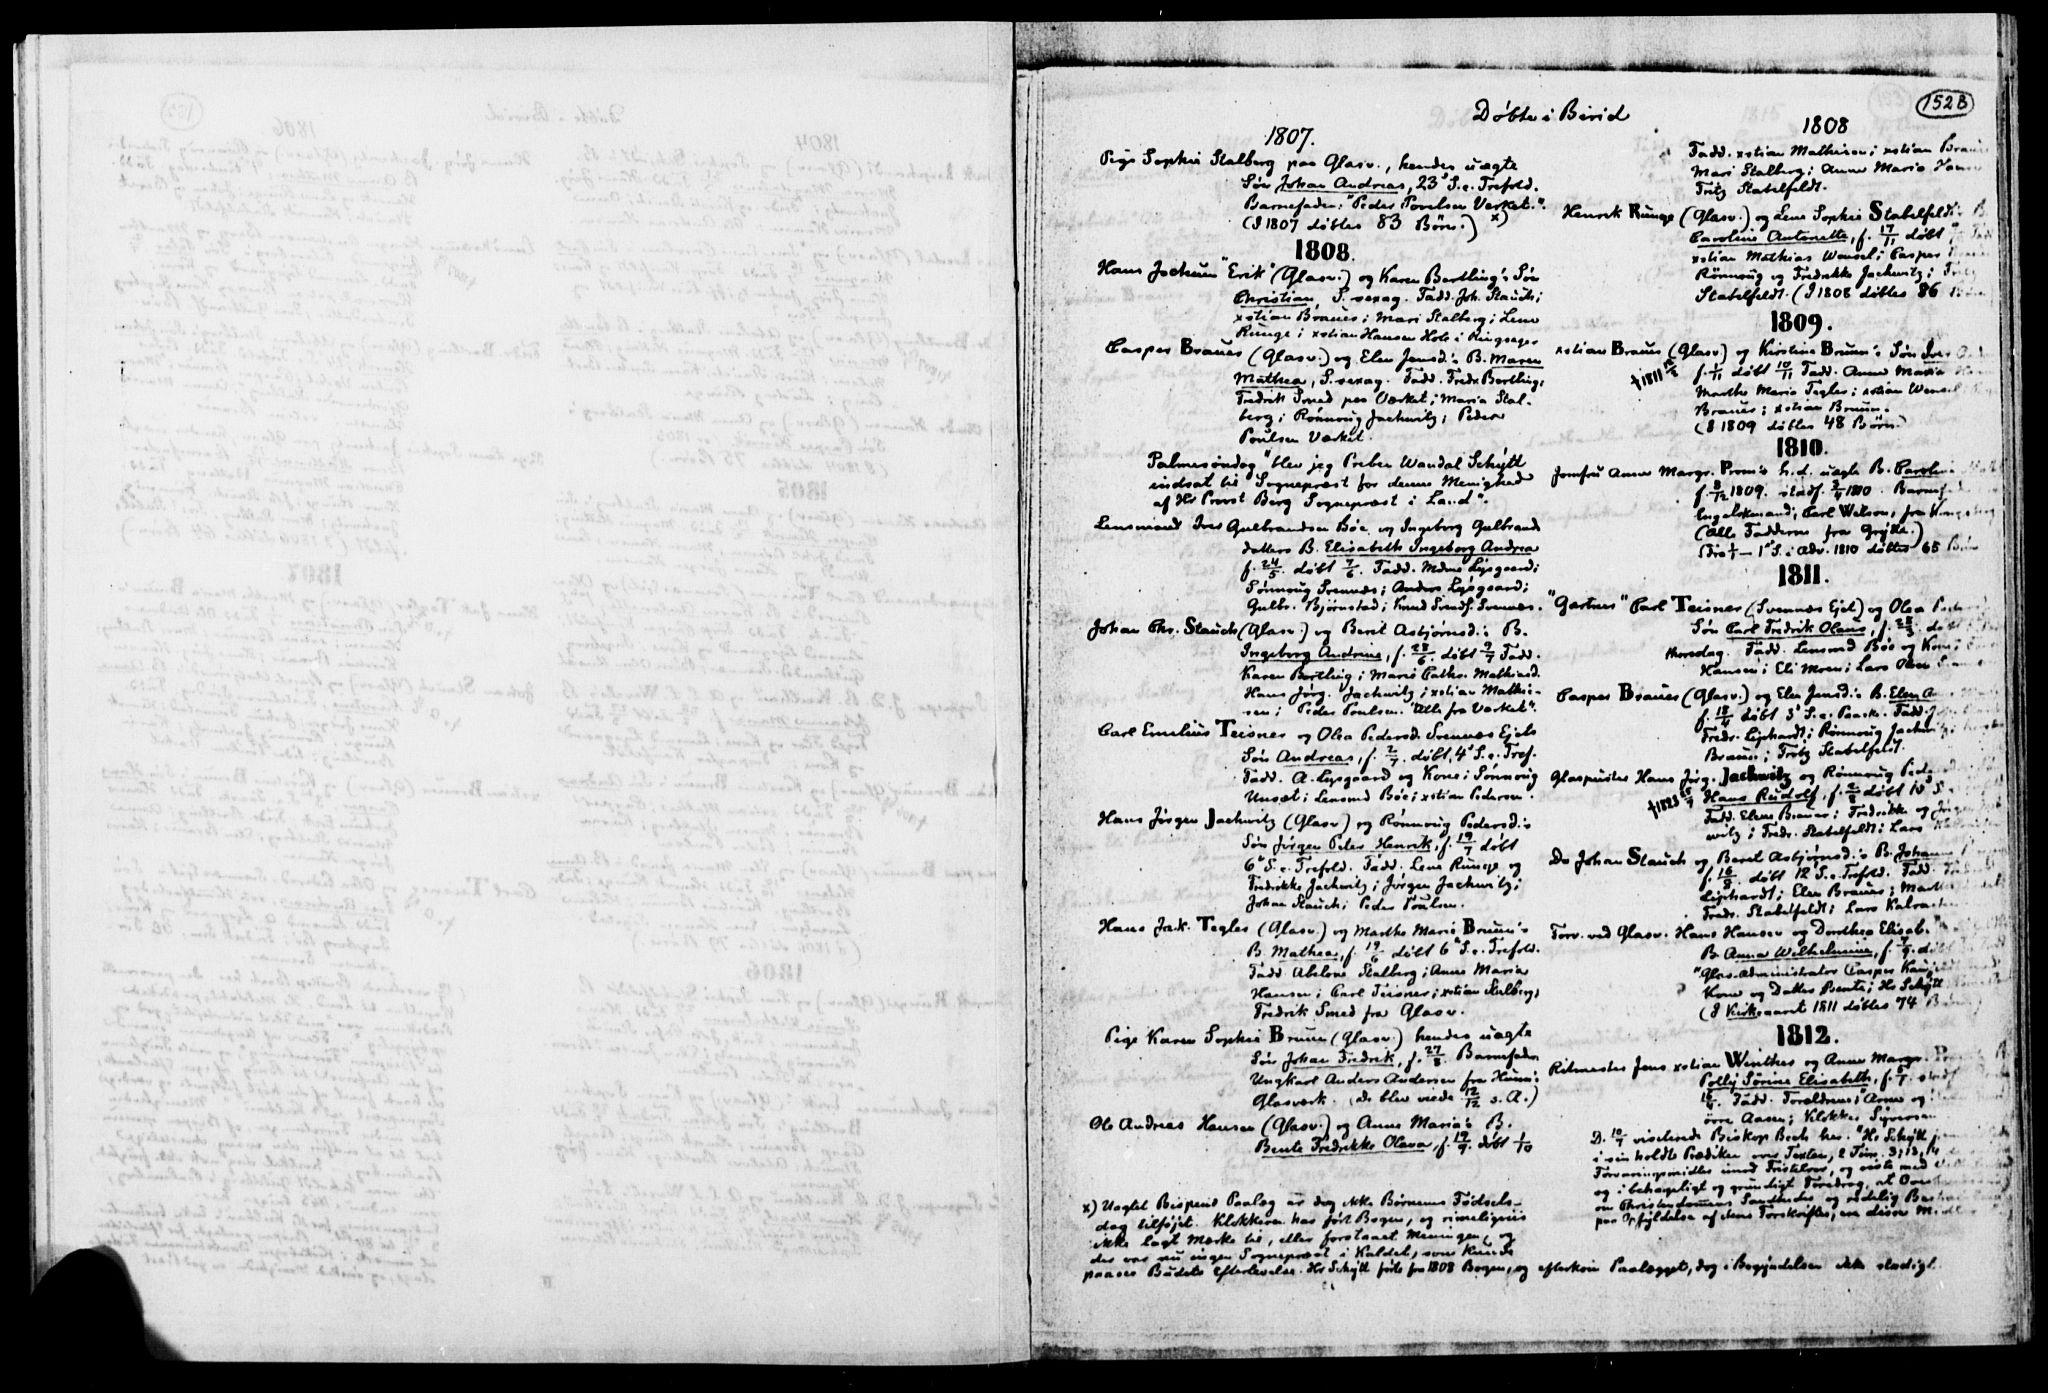 SAH, Biri prestekontor, Ministerialbok, 1730-1879, s. 152b